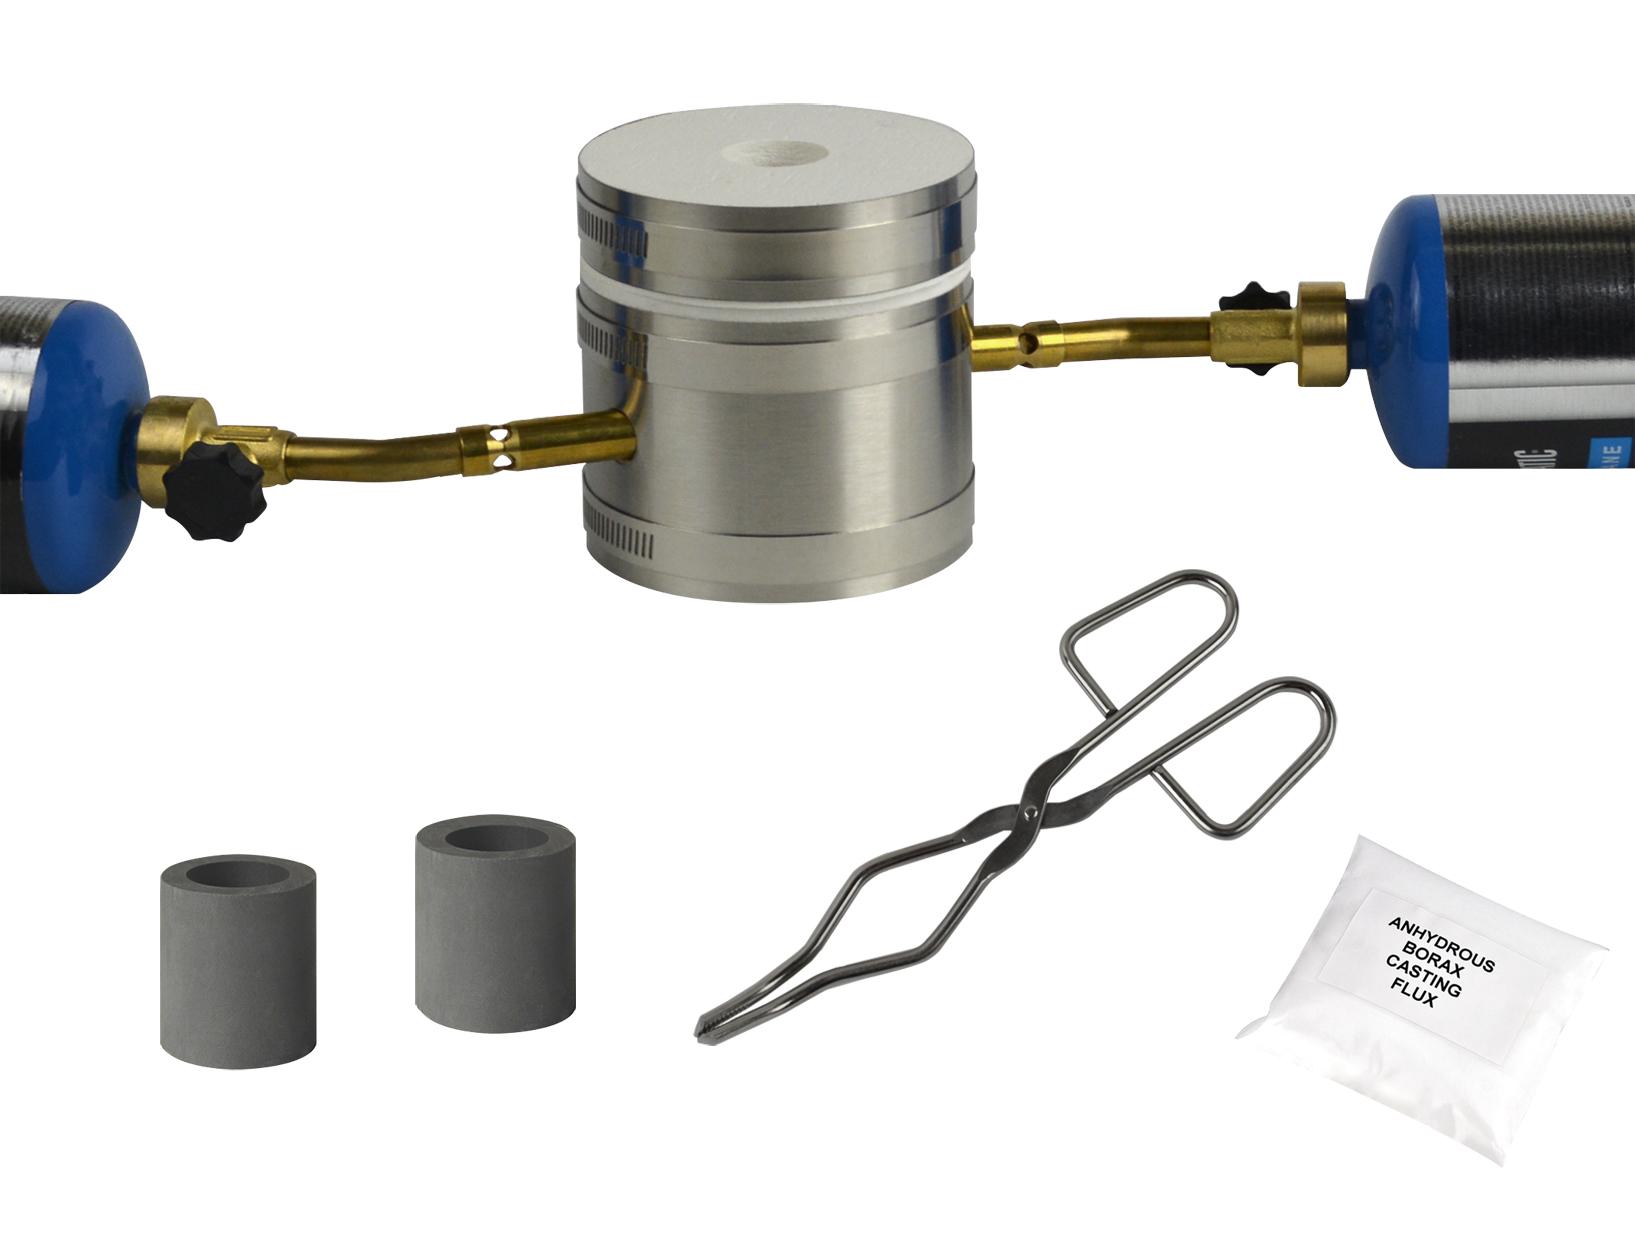 basic mini kwik kiln propane gold silver copper melting furnace set ii kit 0037 pmc supplies. Black Bedroom Furniture Sets. Home Design Ideas